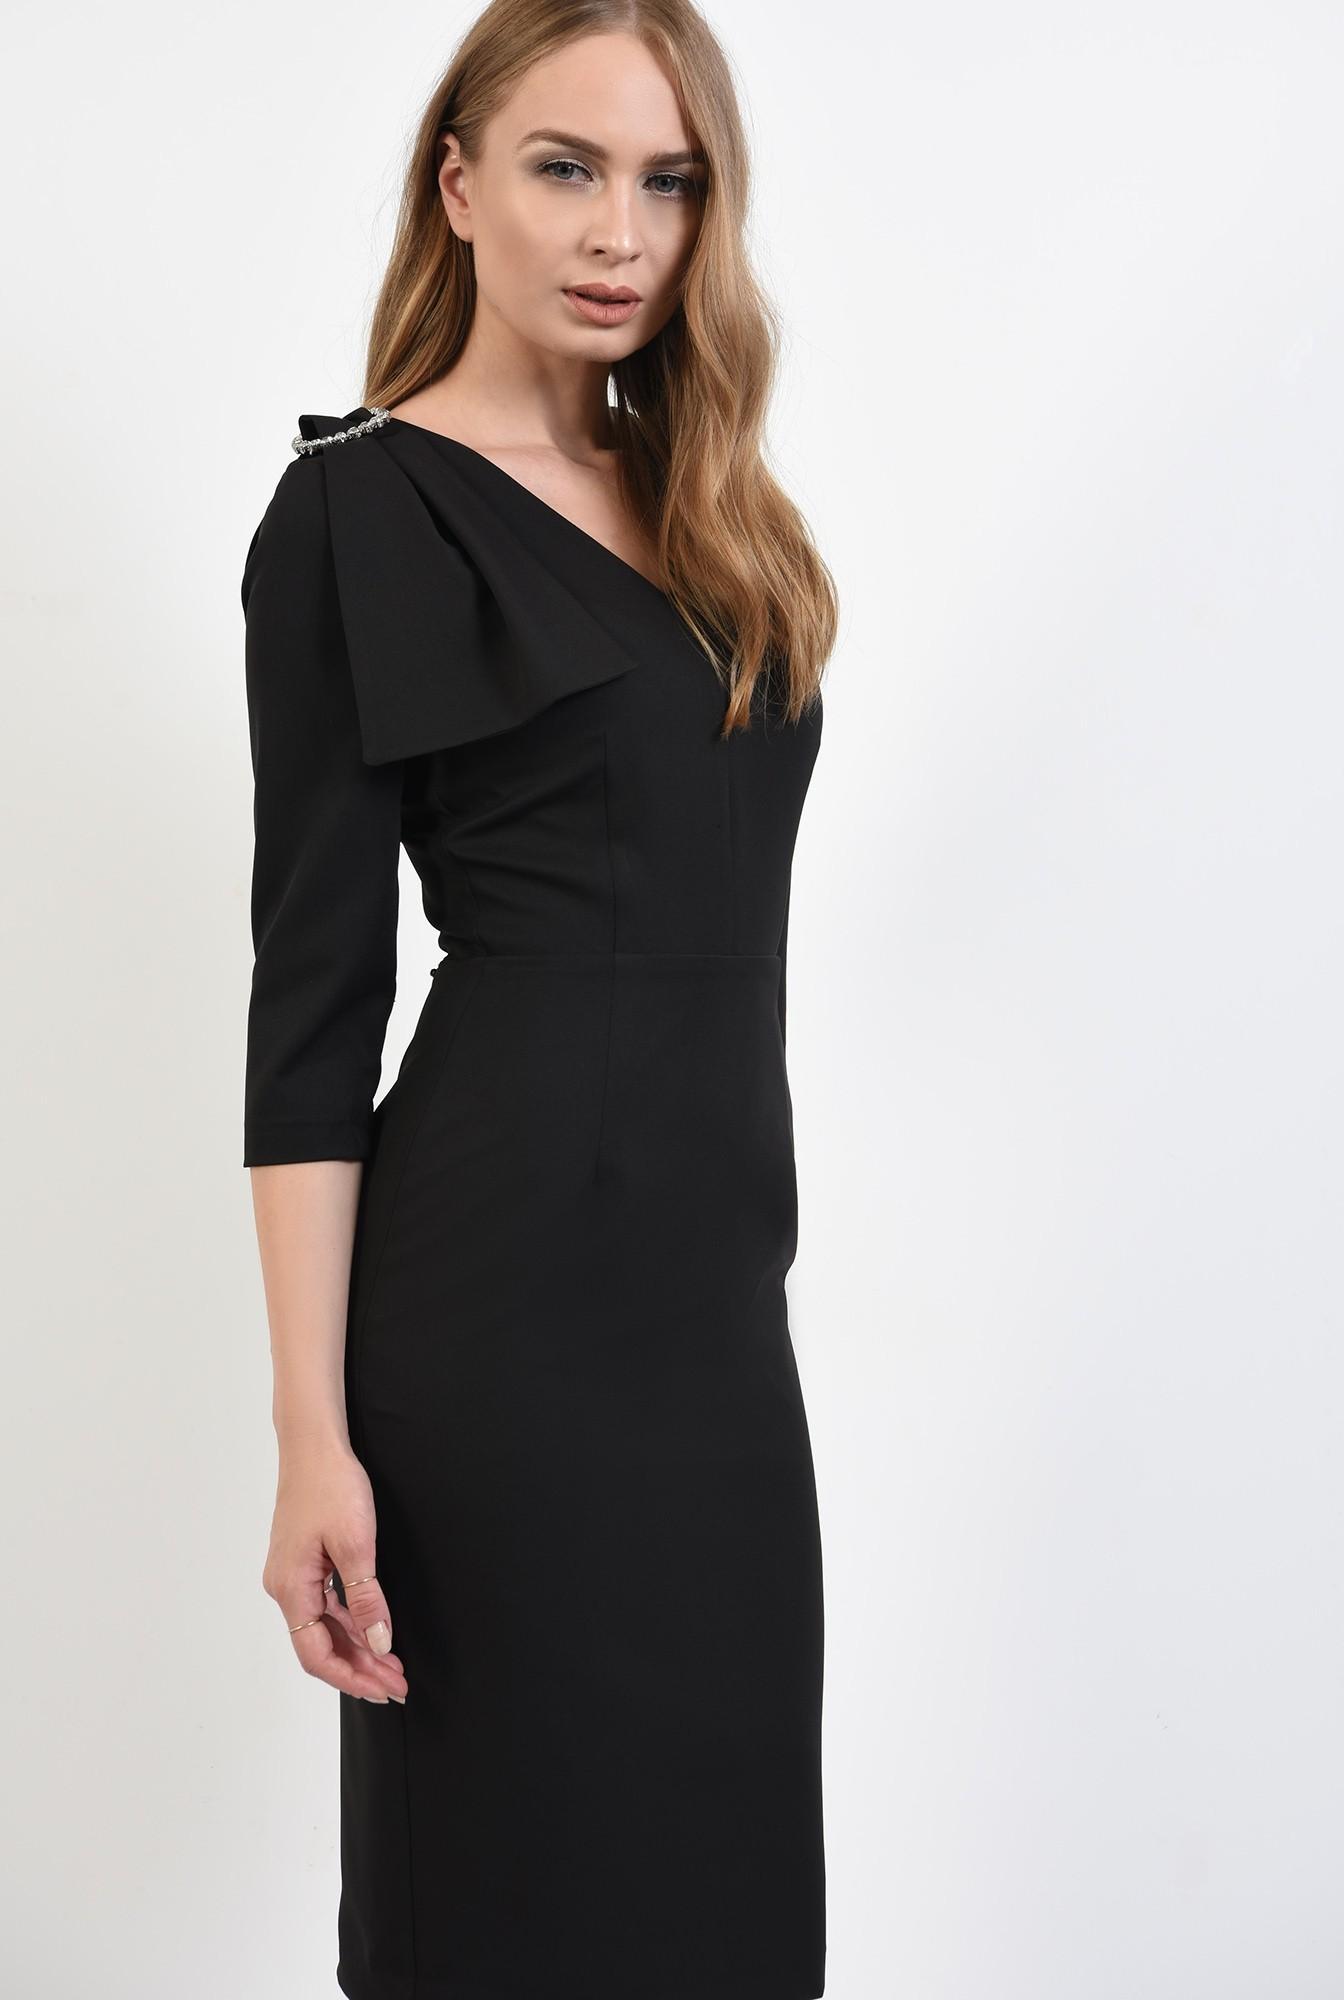 0 - 360 - rochie poema, negra, eleganta, cu funda